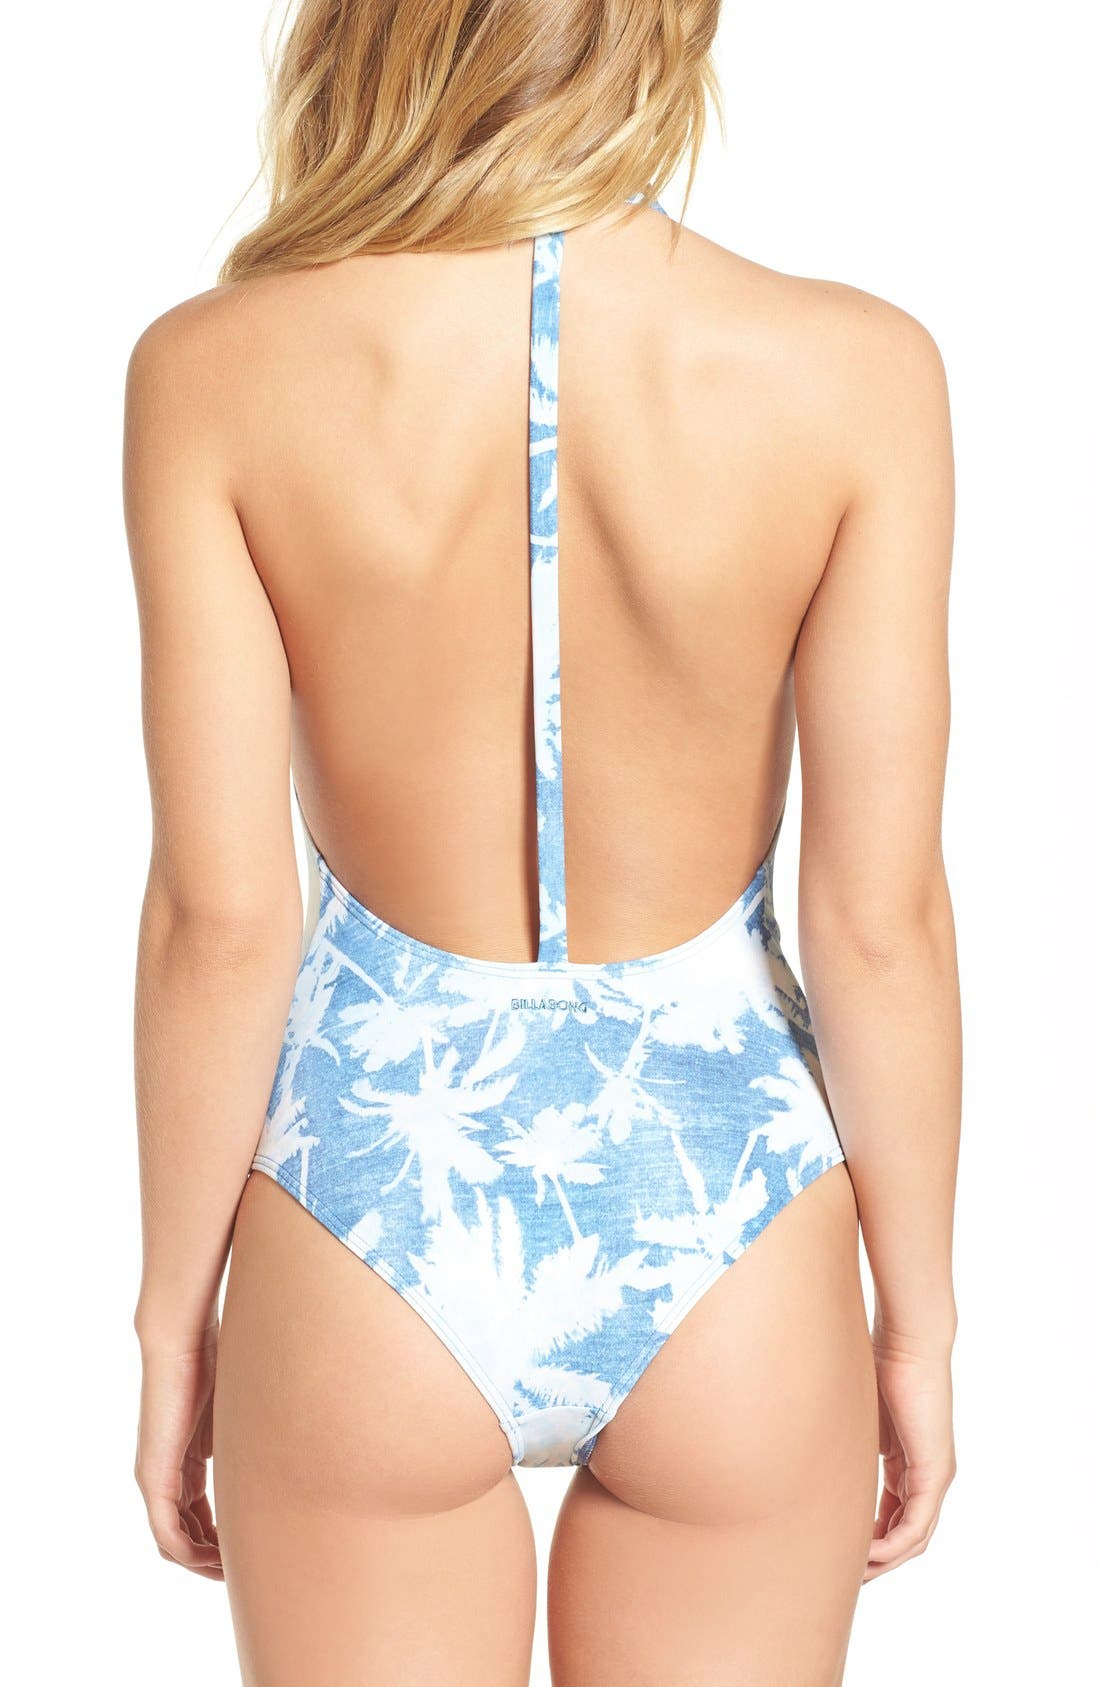 Alternate Image 2  - Billabong 'Indigo Dreams' Print One-Piece Swimsuit